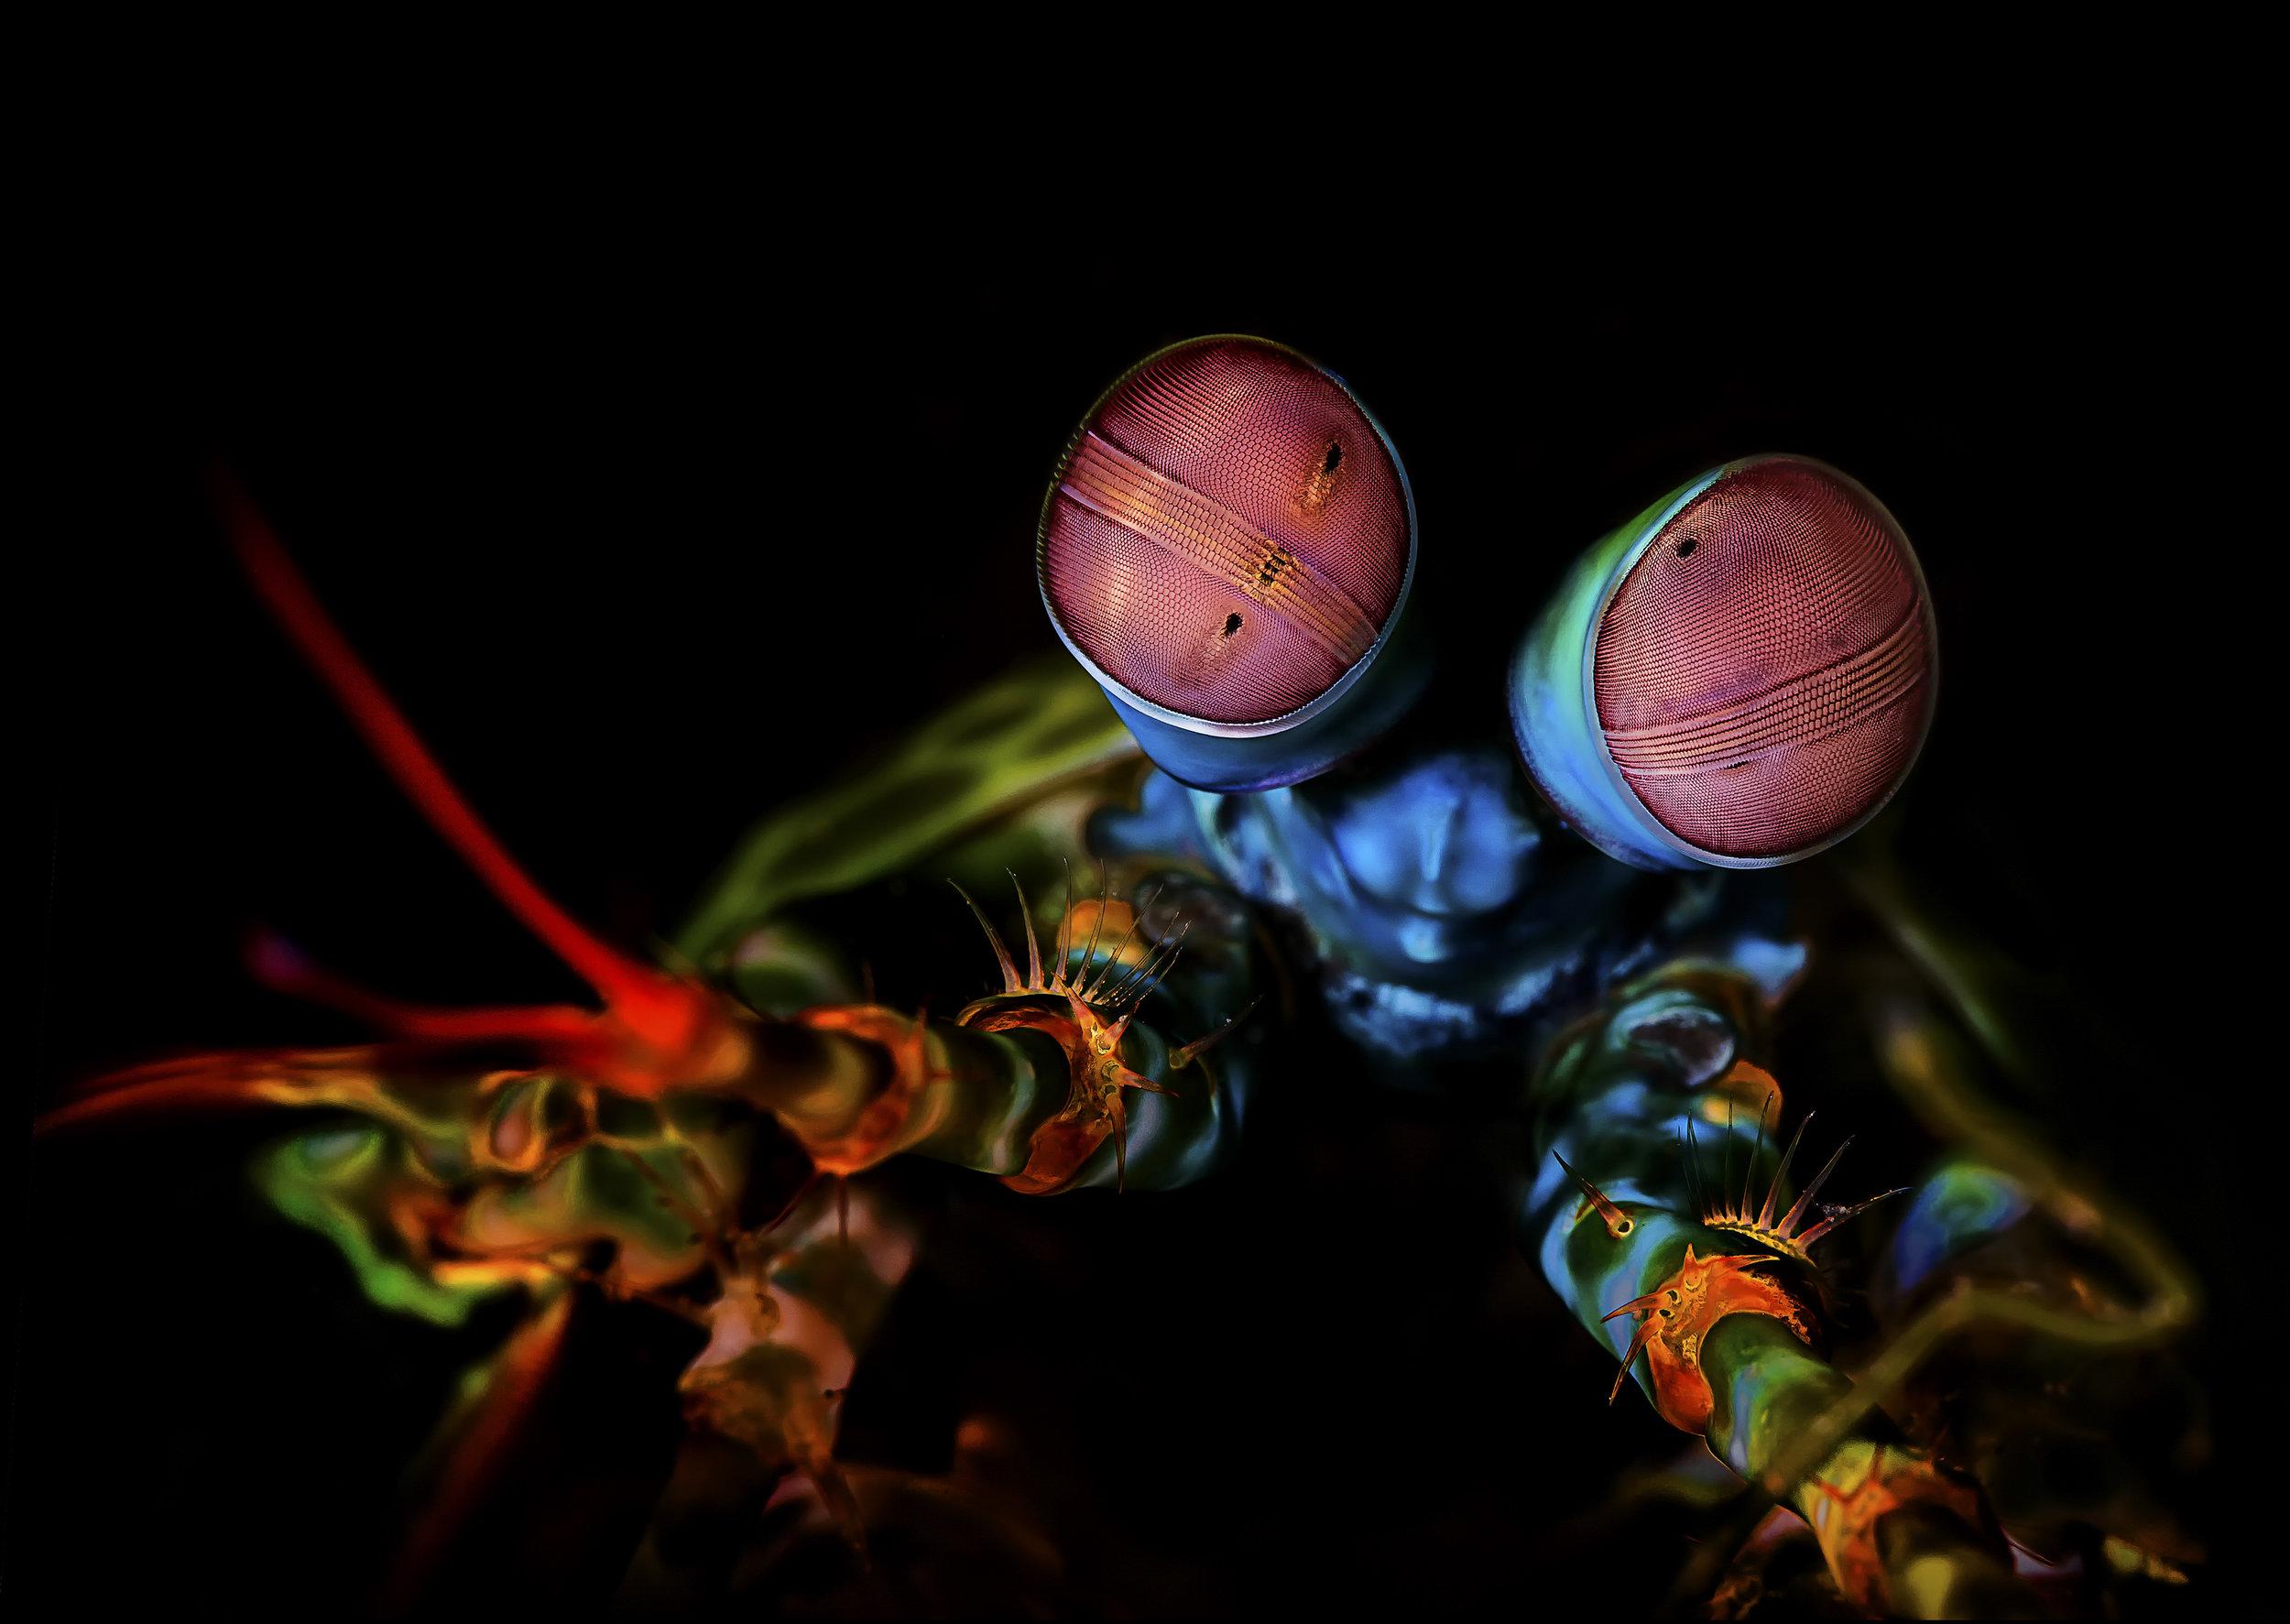 mantis shrimp credit: beth watson / coral reef image bank